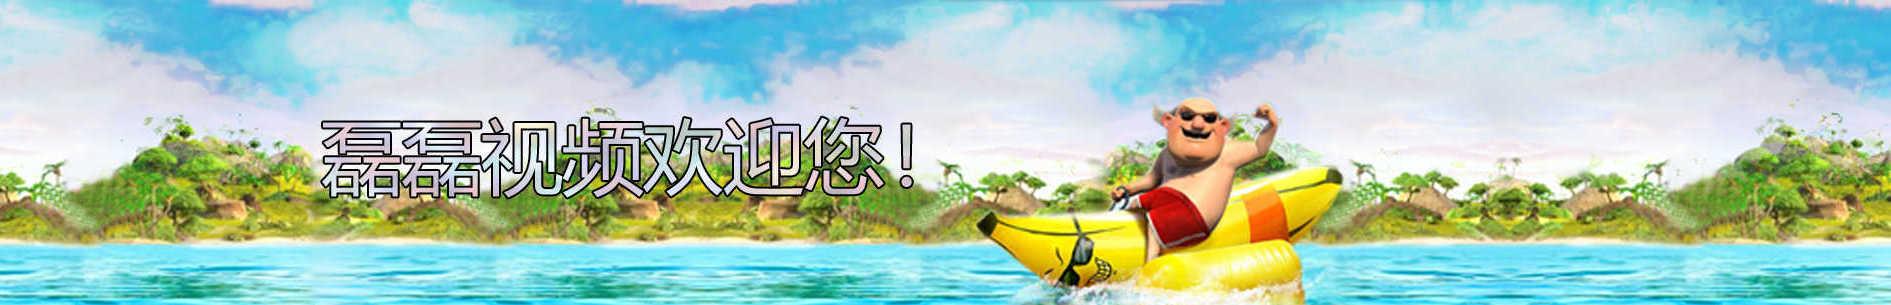 hgl磊磊视频海岛奇兵王者荣耀 banner